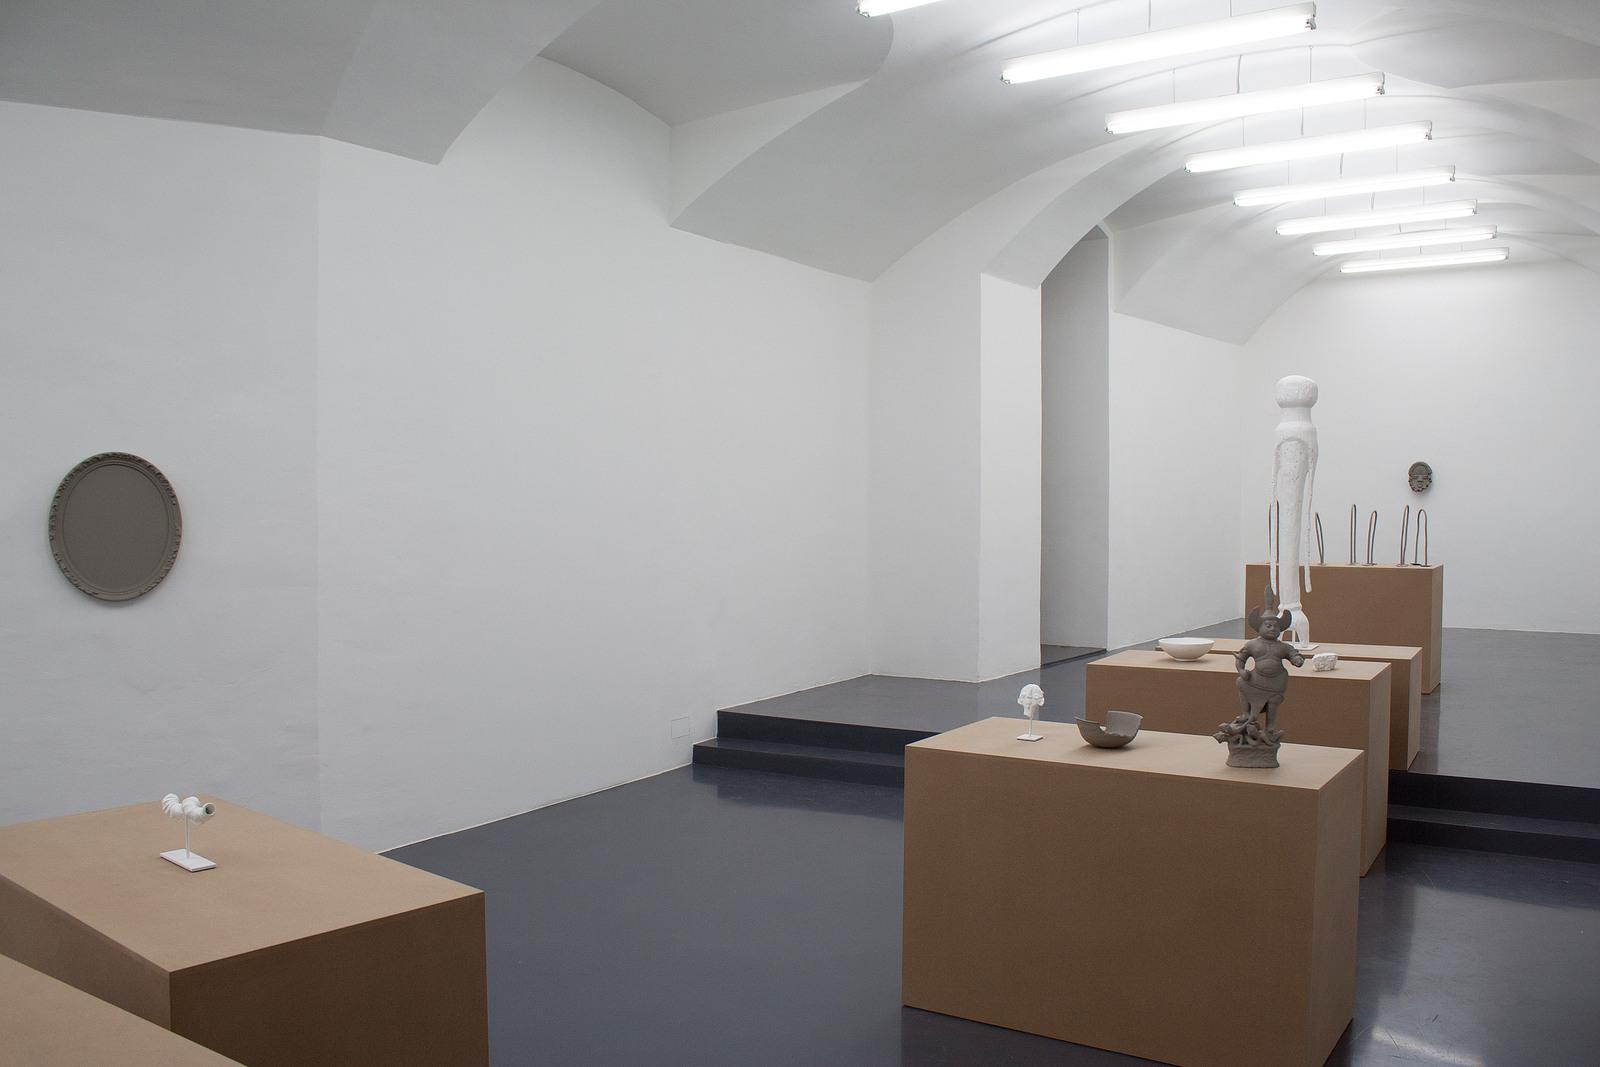 11 Gaylen Gerber exhibition Galerie Emanuel Layr Wien 2016 IMG_8394